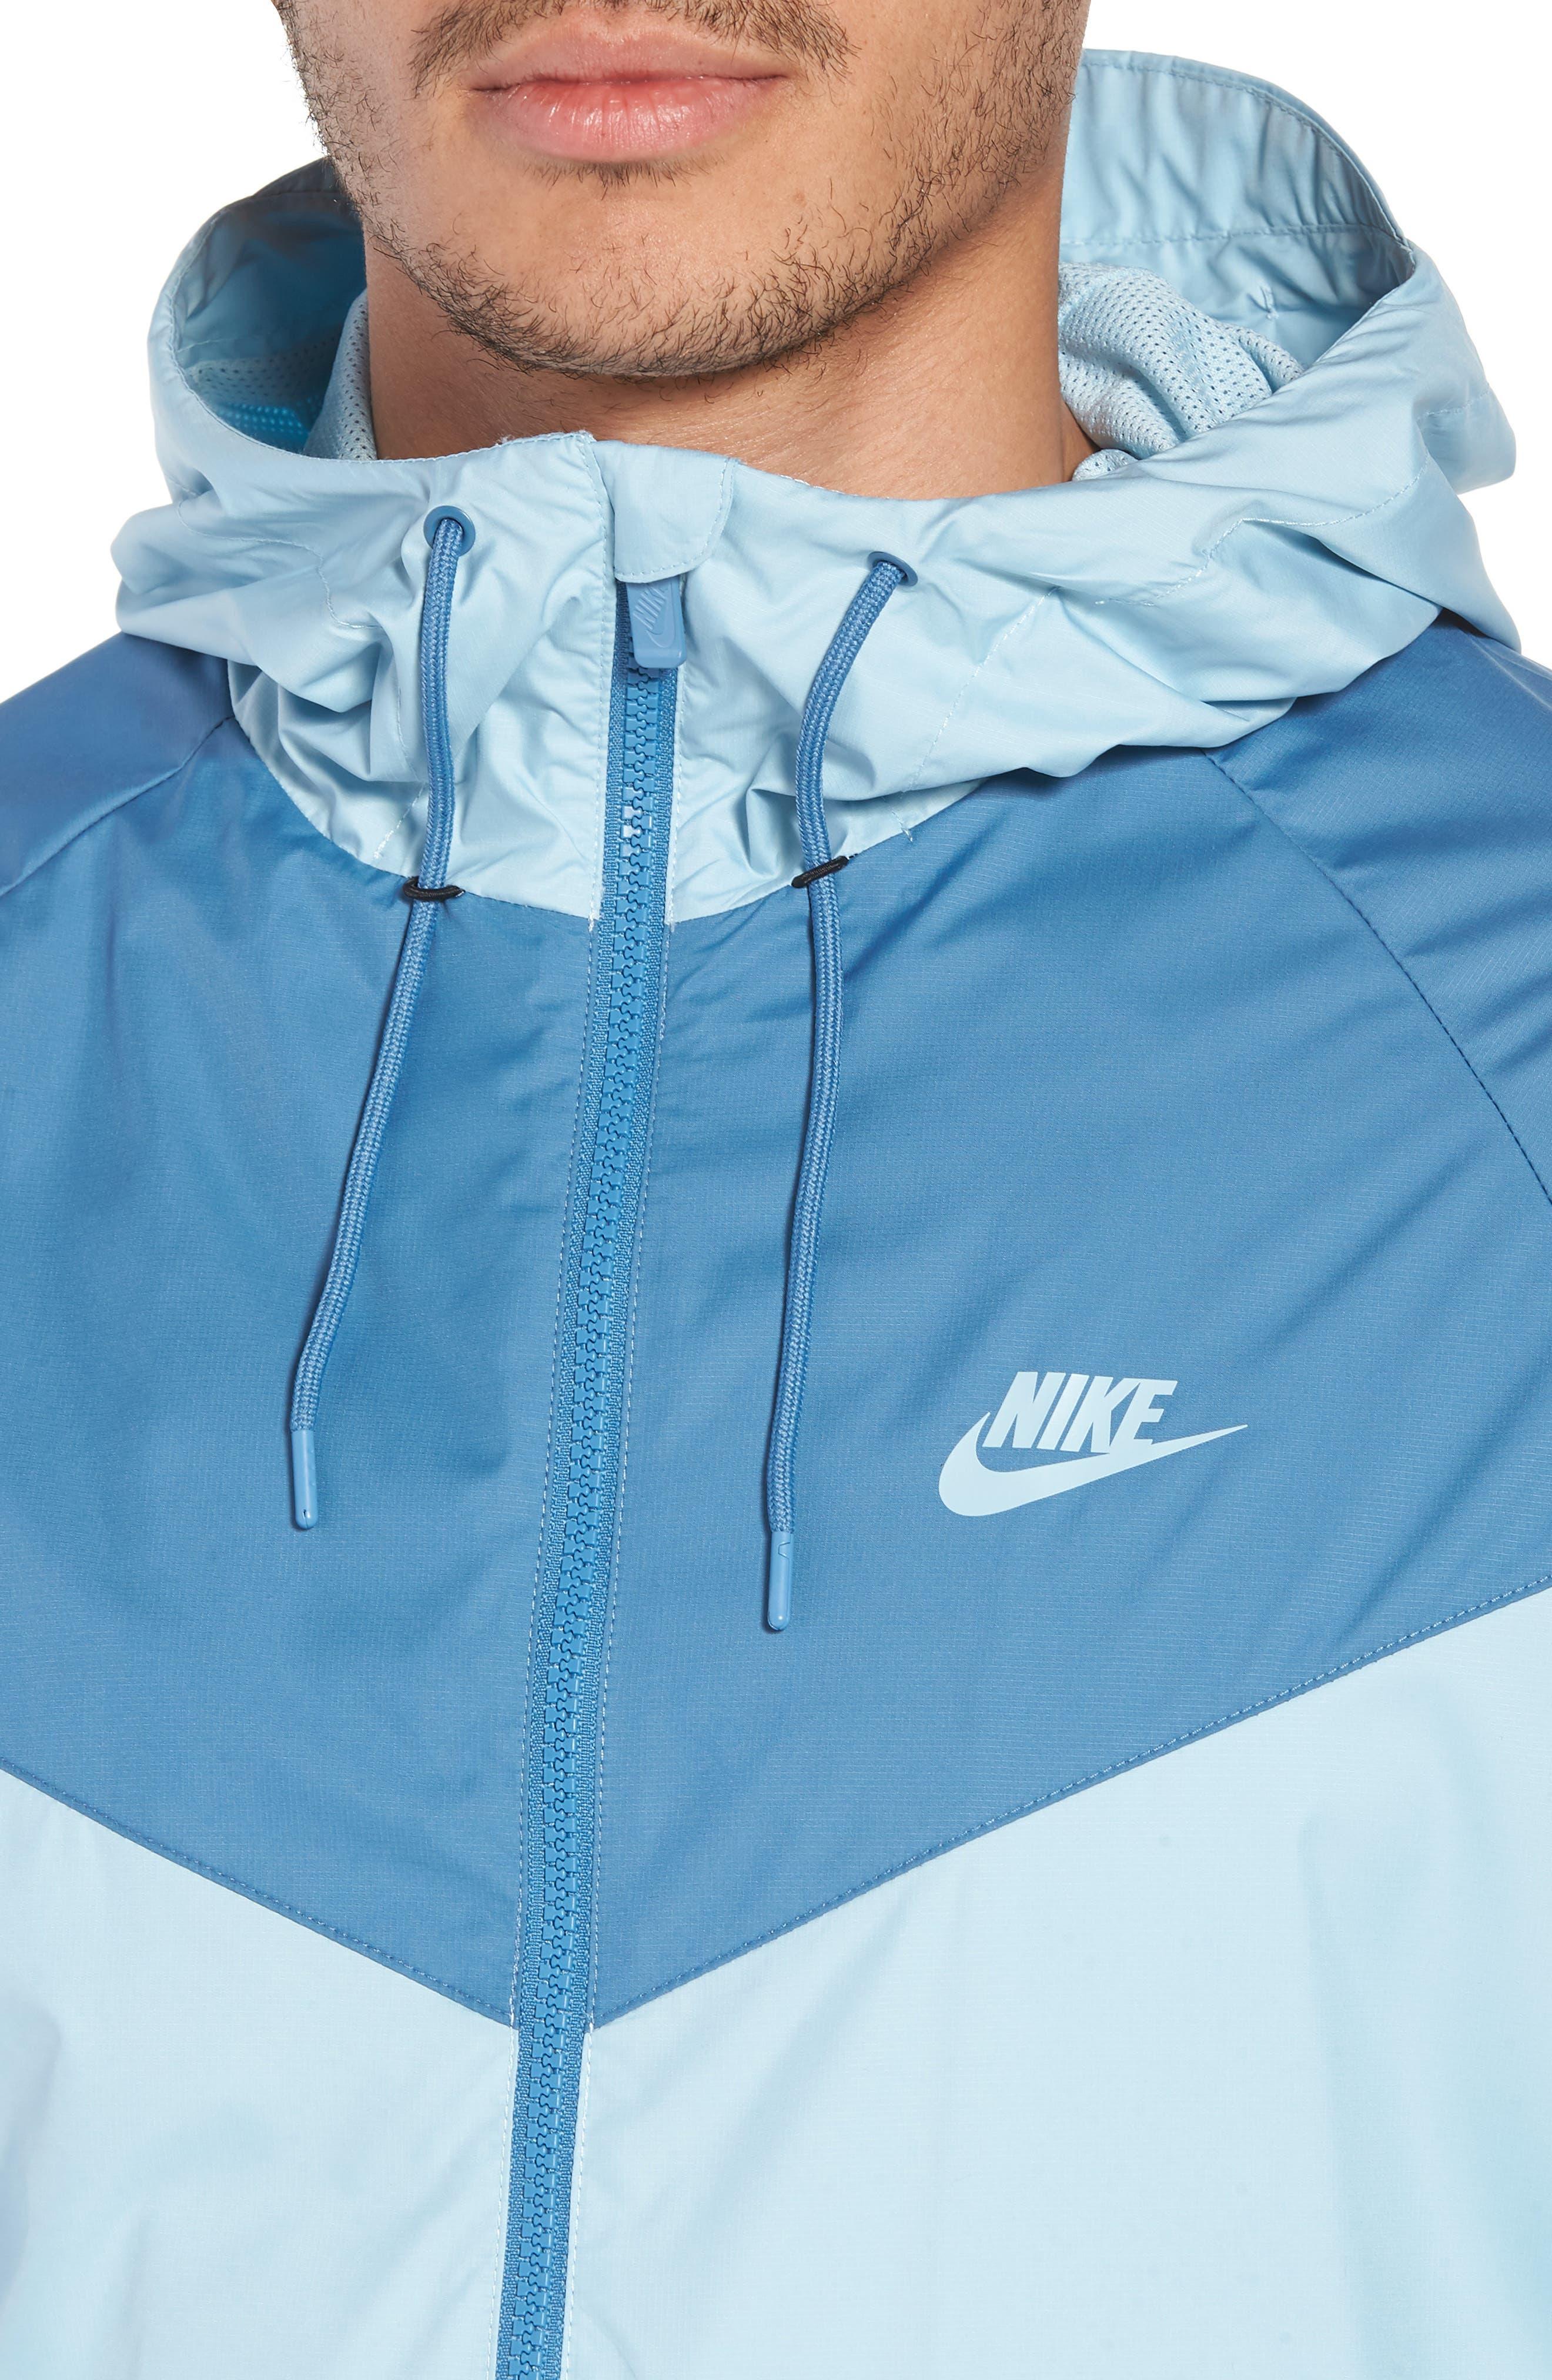 NIKE, Windrunner Colorblock Jacket, Alternate thumbnail 5, color, OCEAN BLISS/ AEGEAN STORM